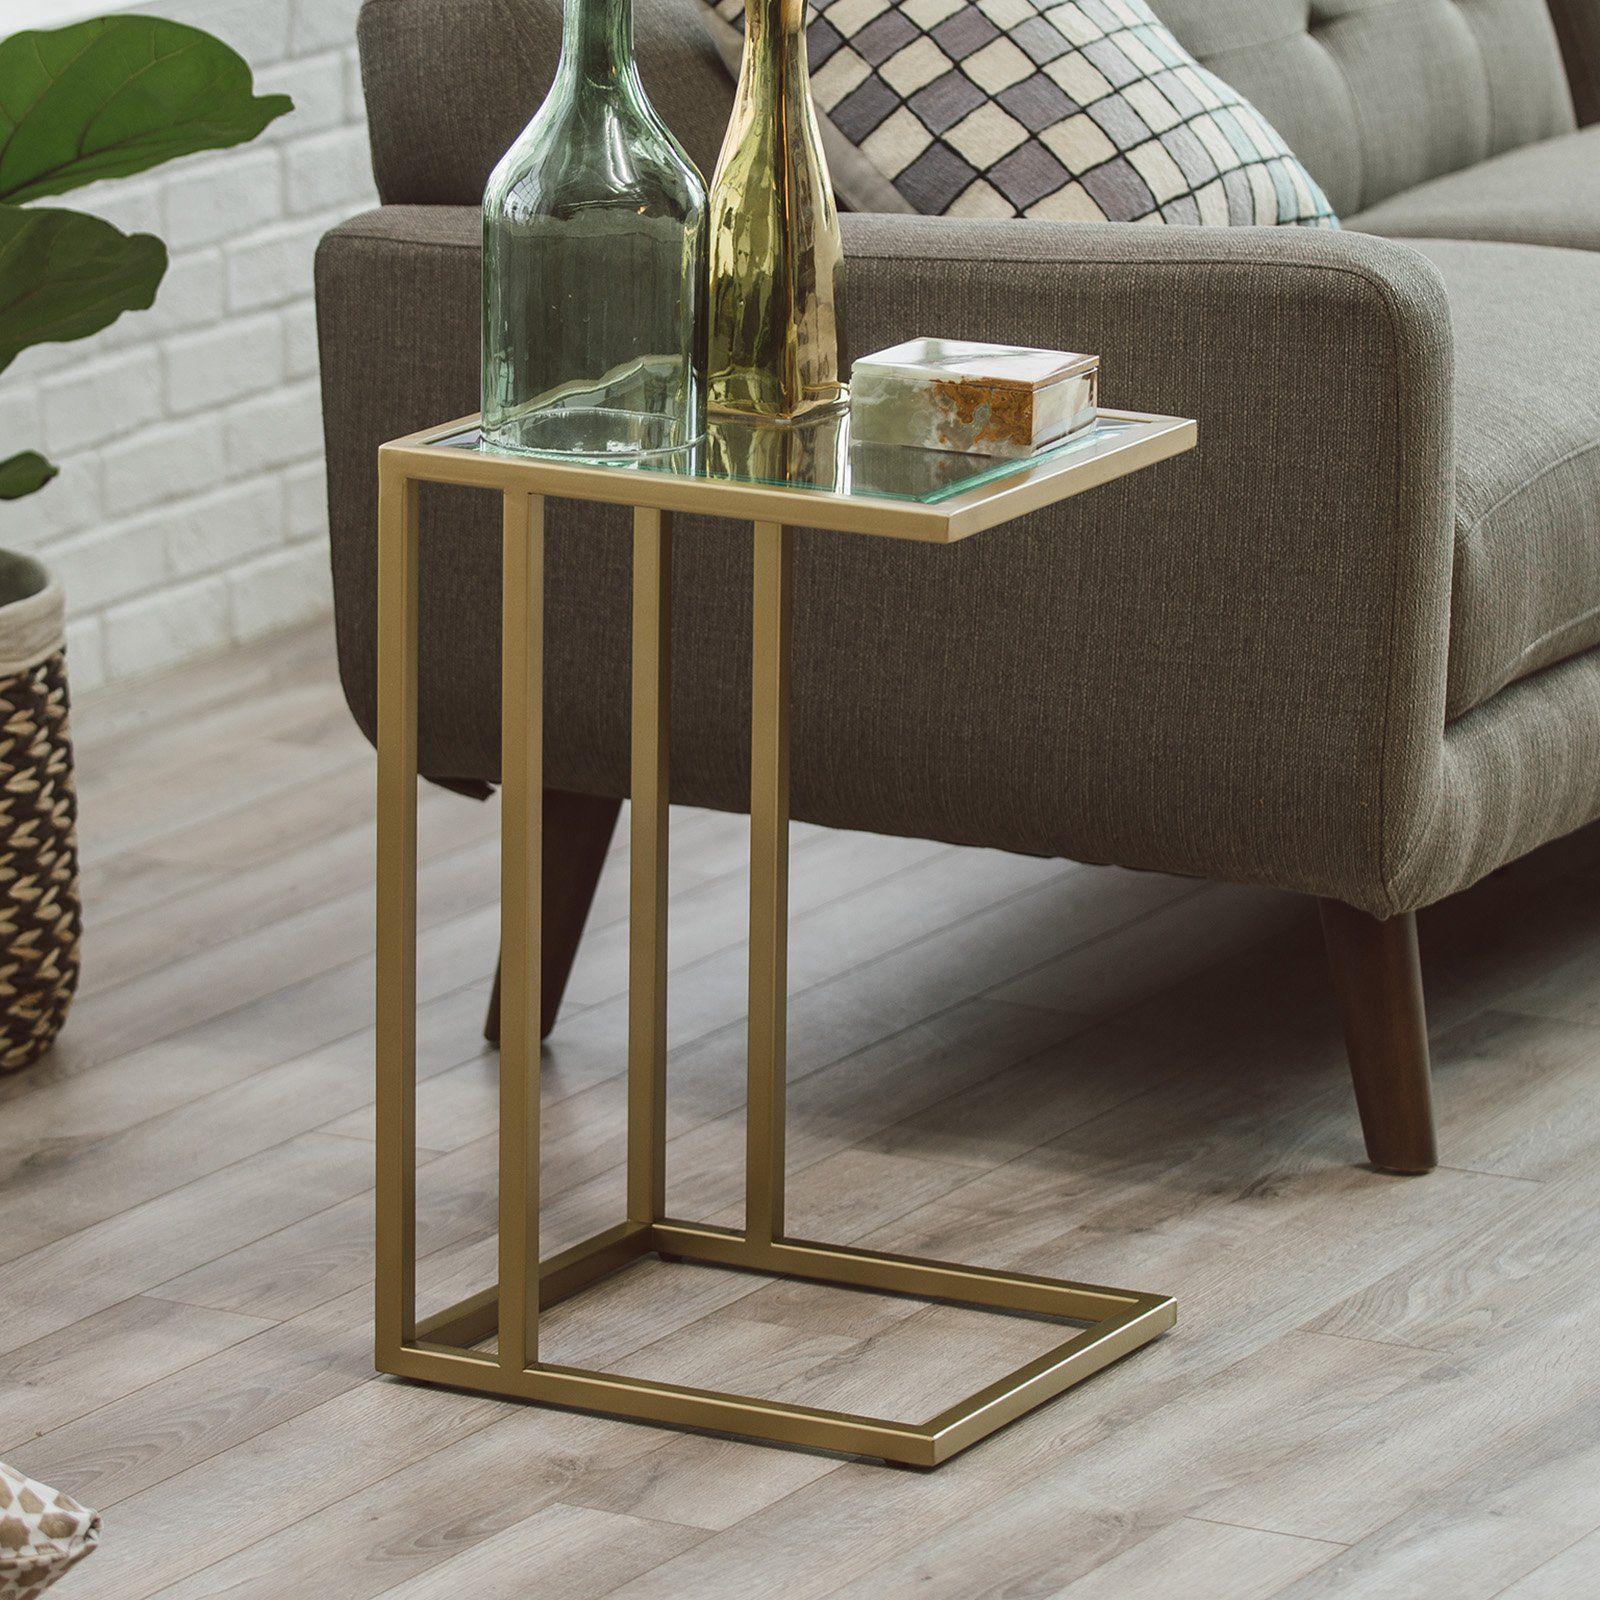 Belham Living Lamont C Table Gold C Table